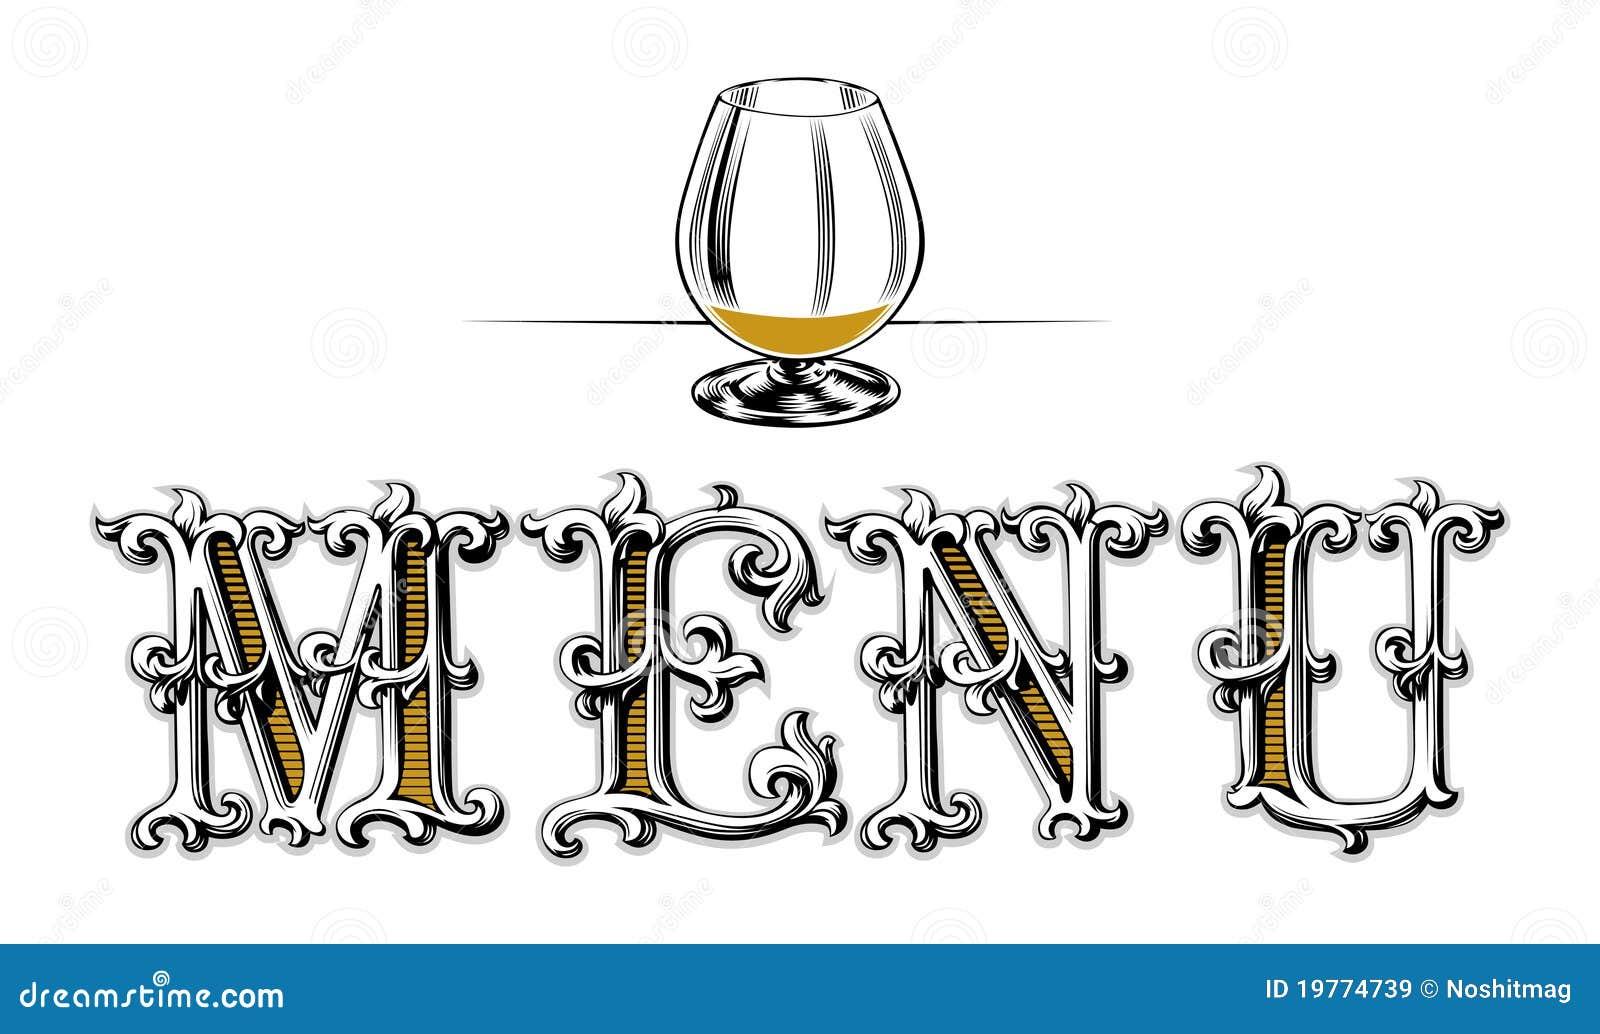 Blank glass menywine